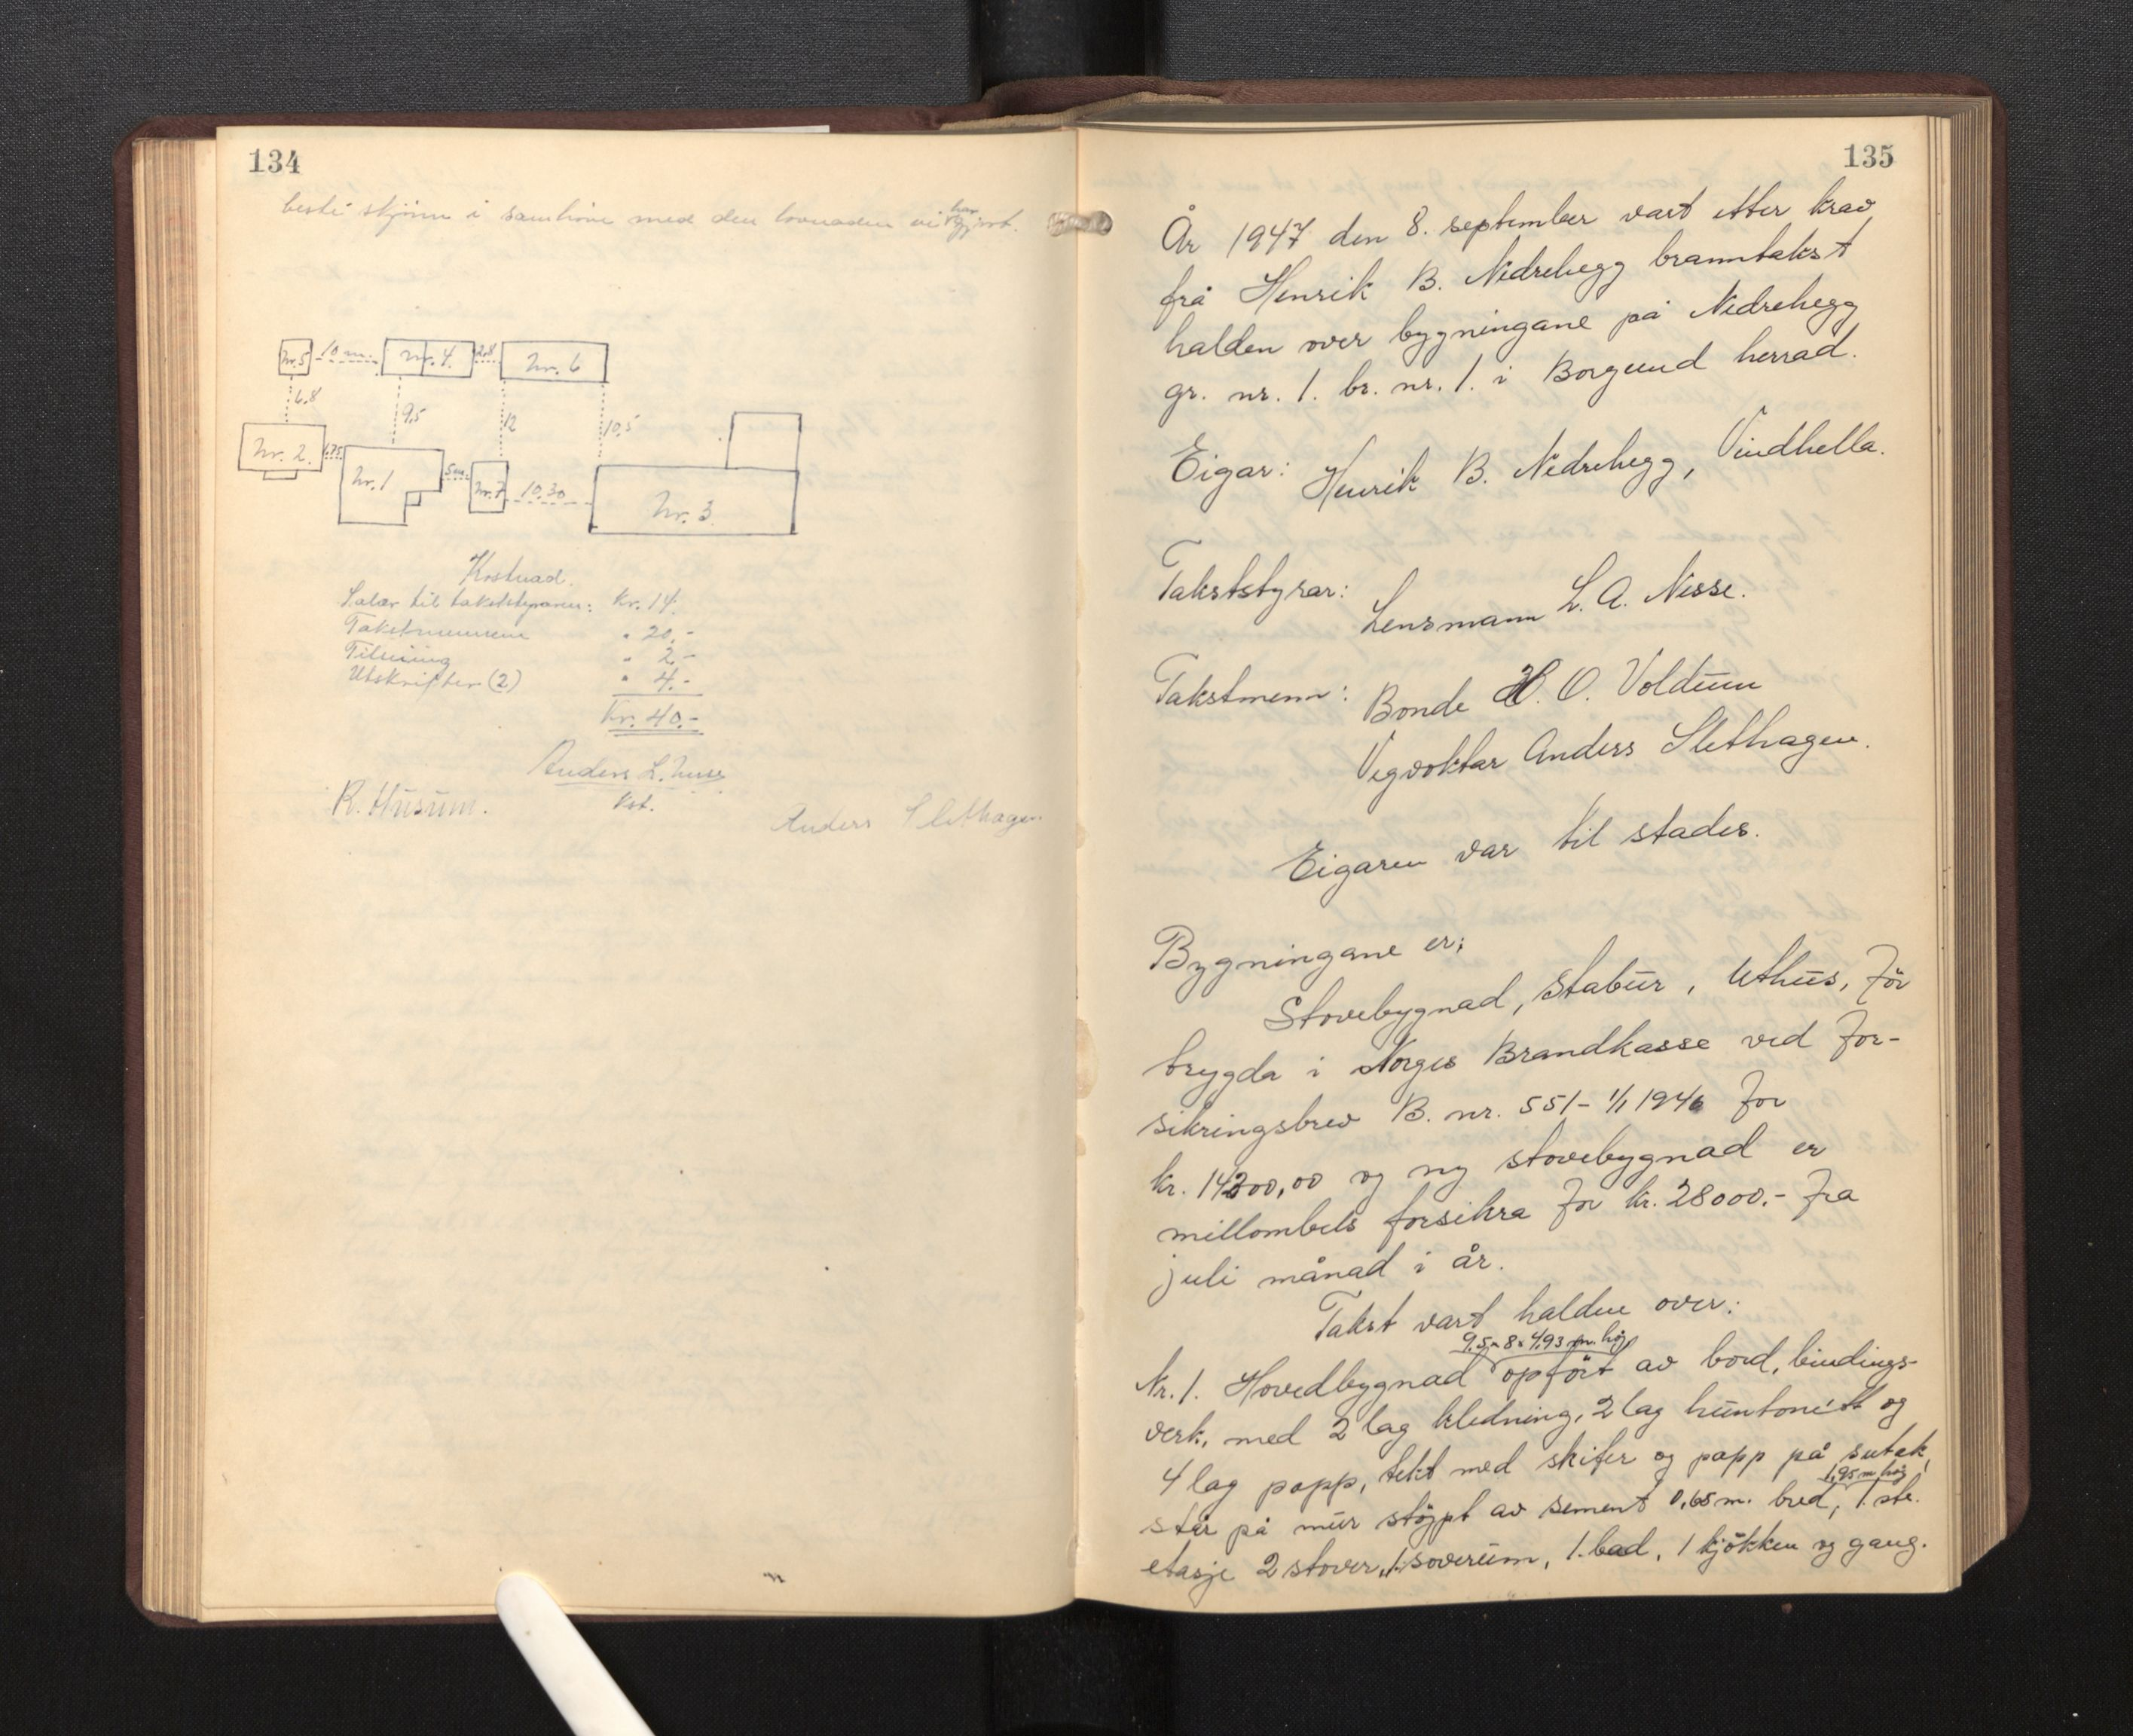 SAB, Lensmannen i Borgund, 0012/L0002: Branntakstprotokoll, 1929-1933, p. 134-135